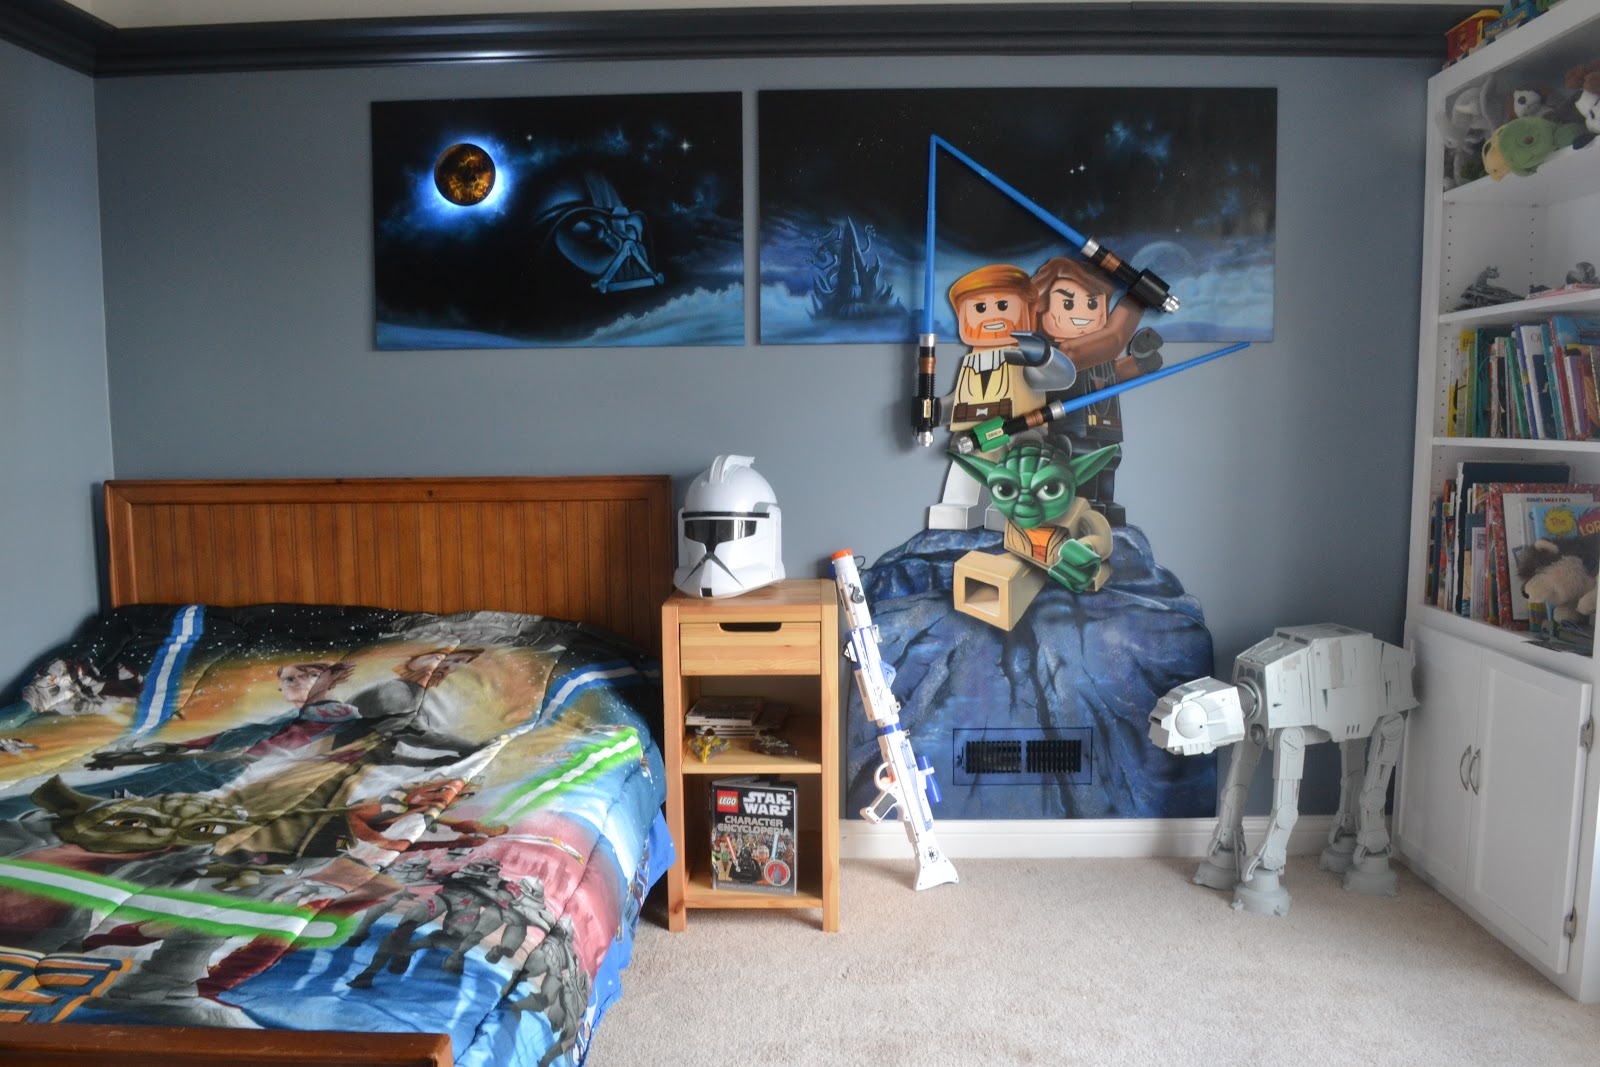 Lego Star Wars Room Decor